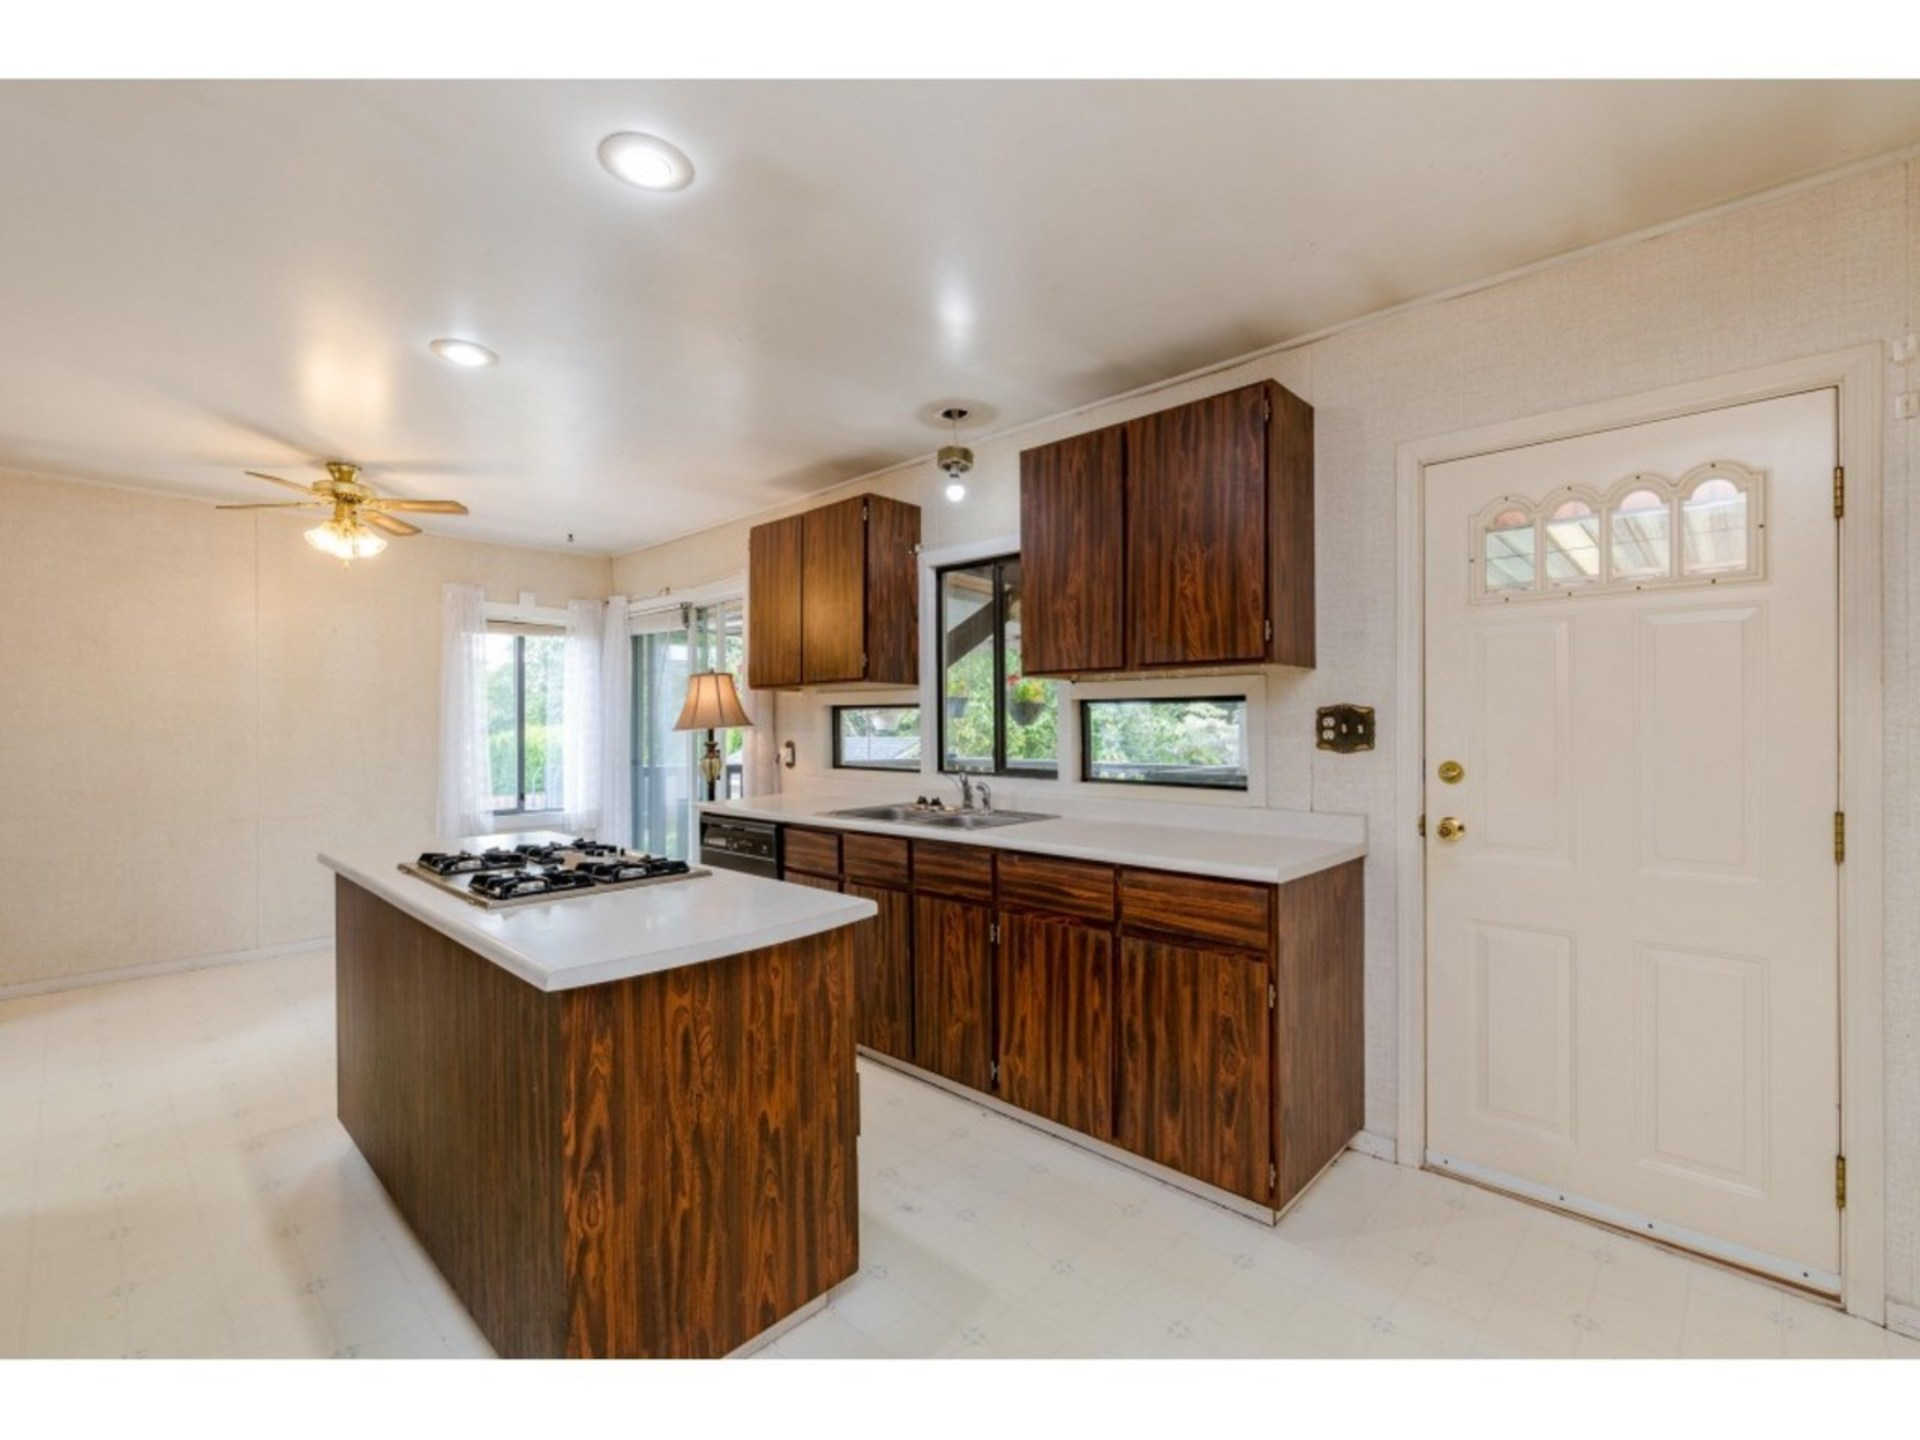 5771-172-street-cloverdale-bc-cloverdale-06 at 5771 172 Street, Cloverdale BC, Cloverdale